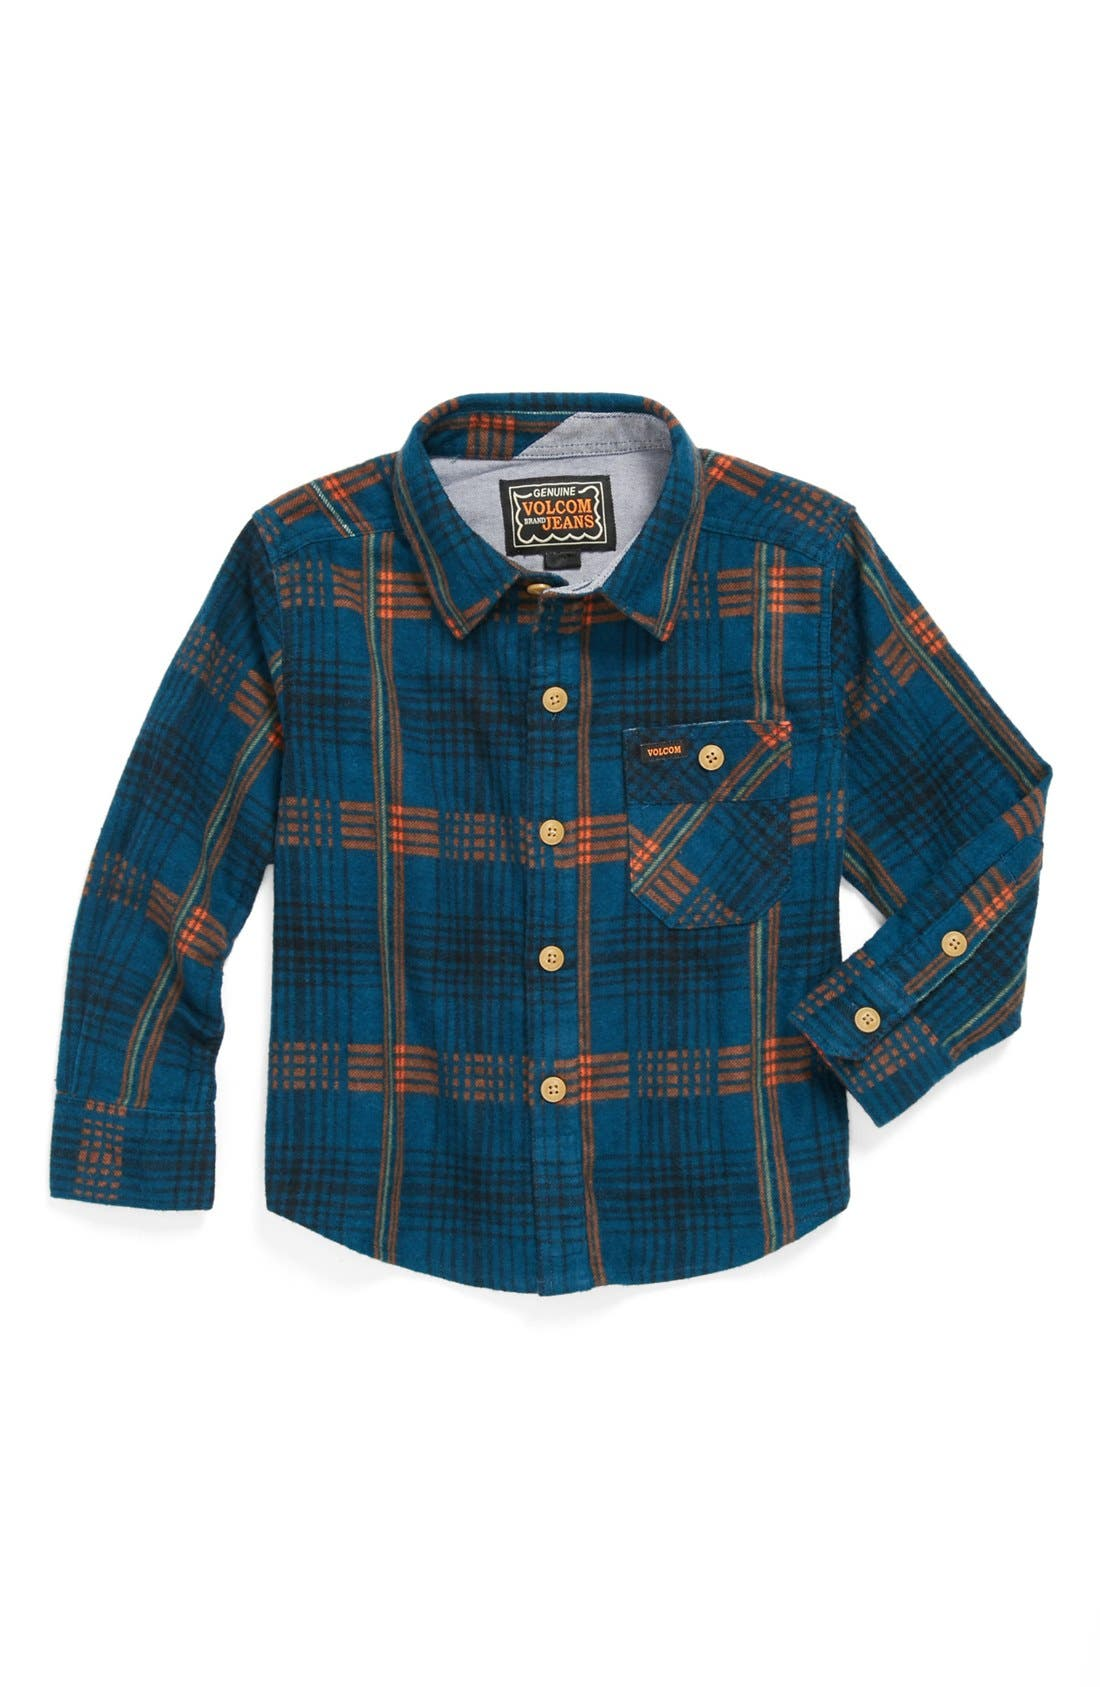 Main Image - Volcom 'Harry' Plaid Shirt (Toddler Boys)